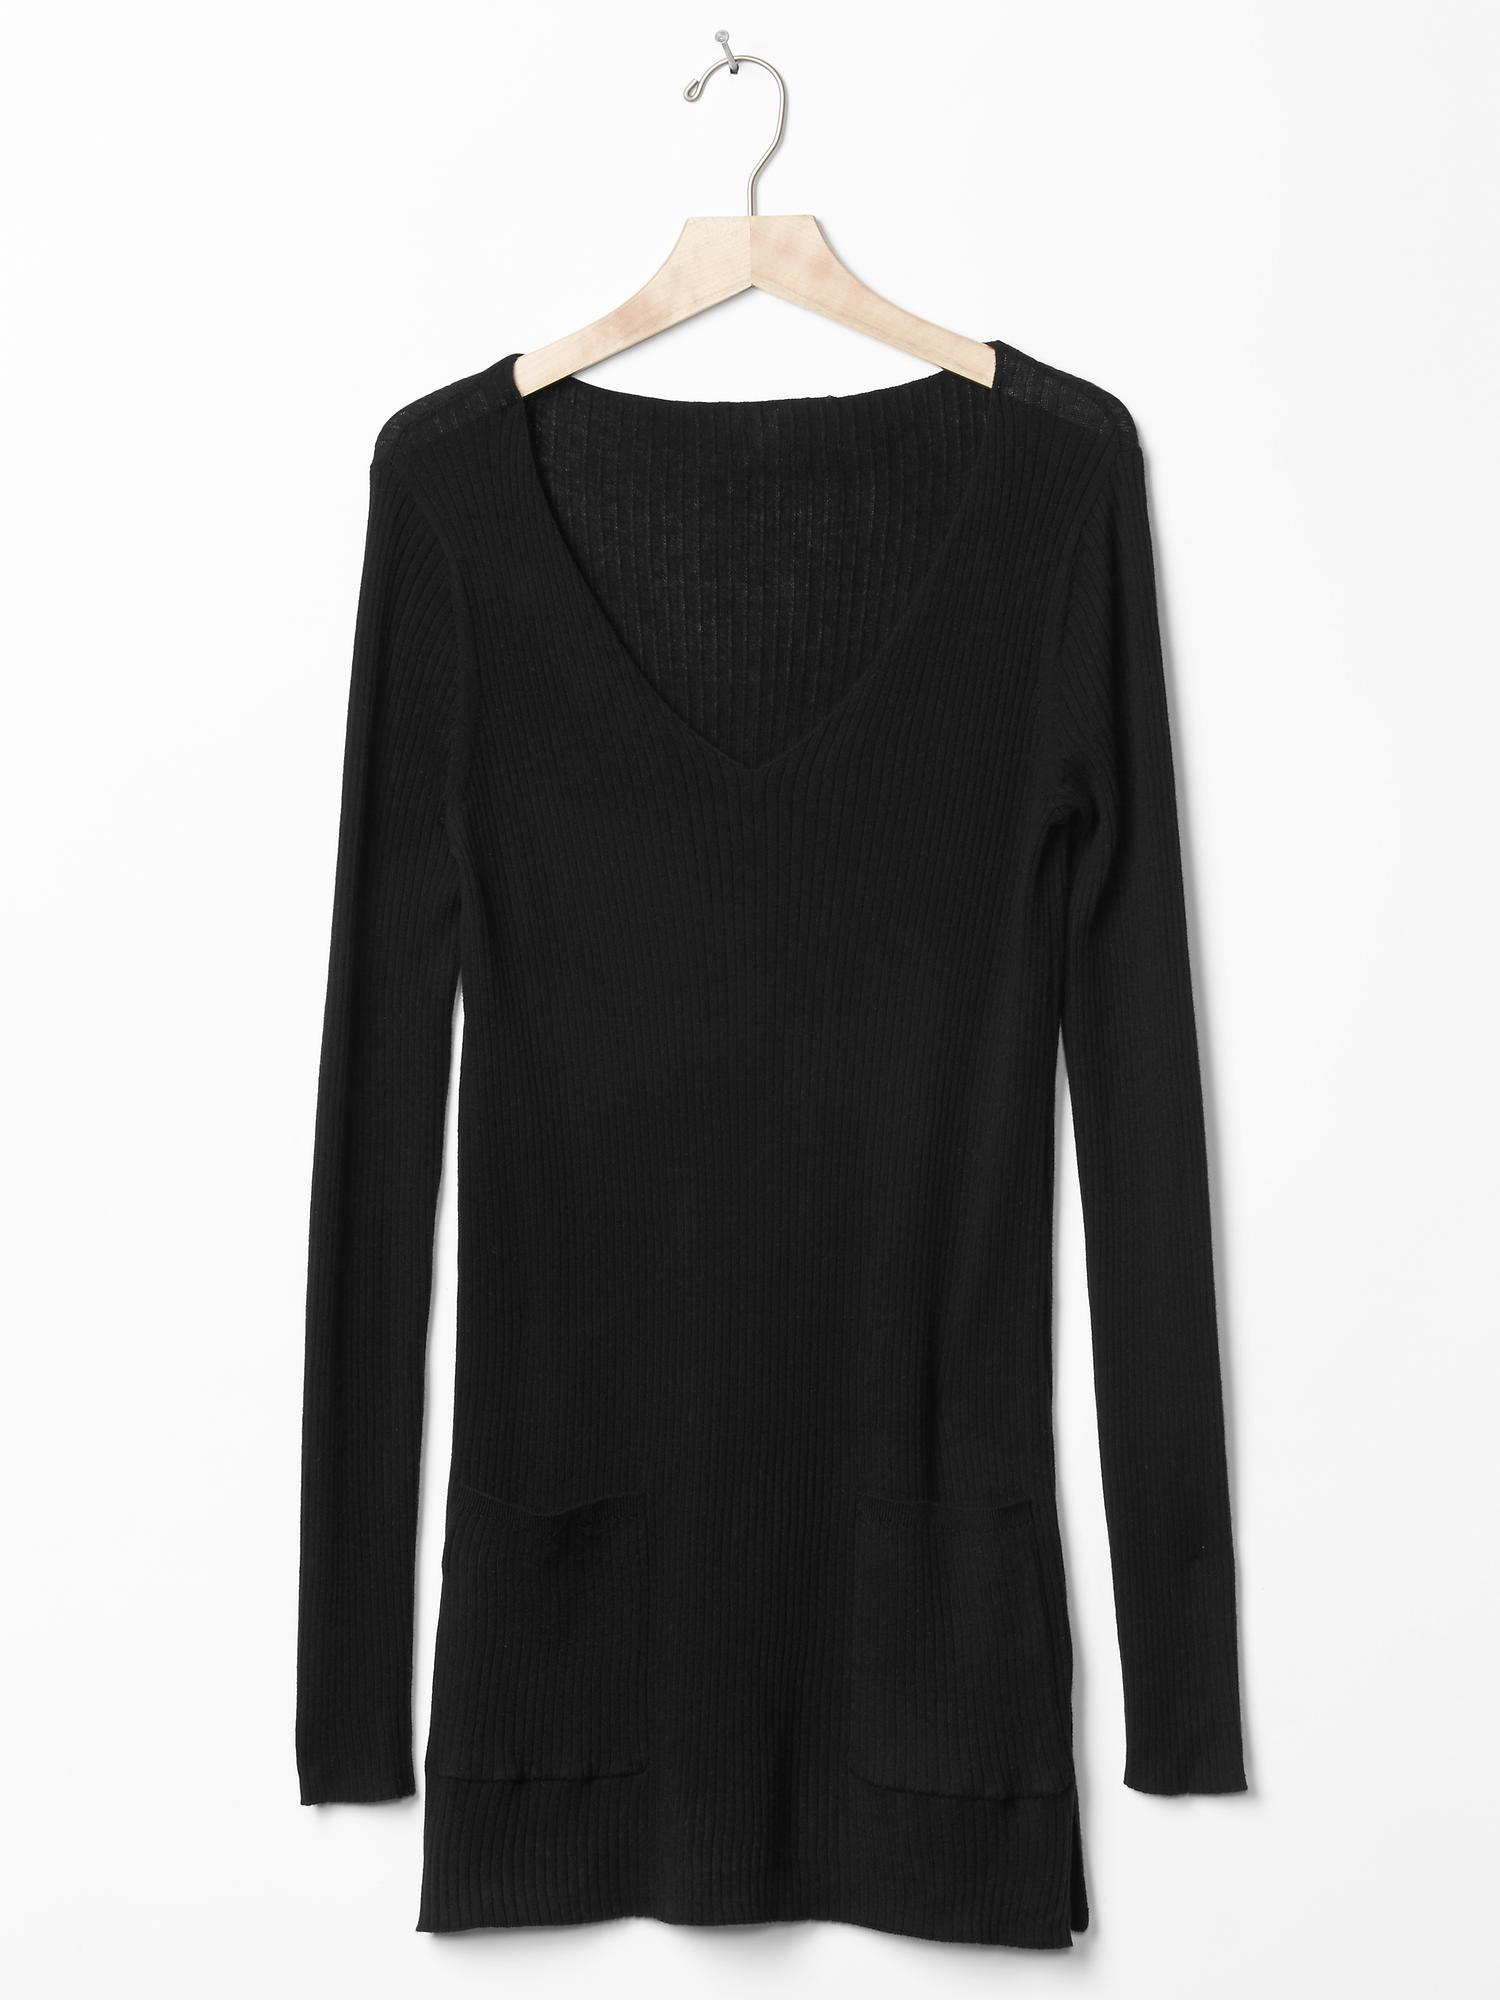 Gap Pure Body Ribbed Tunic Sweater In Black True Black